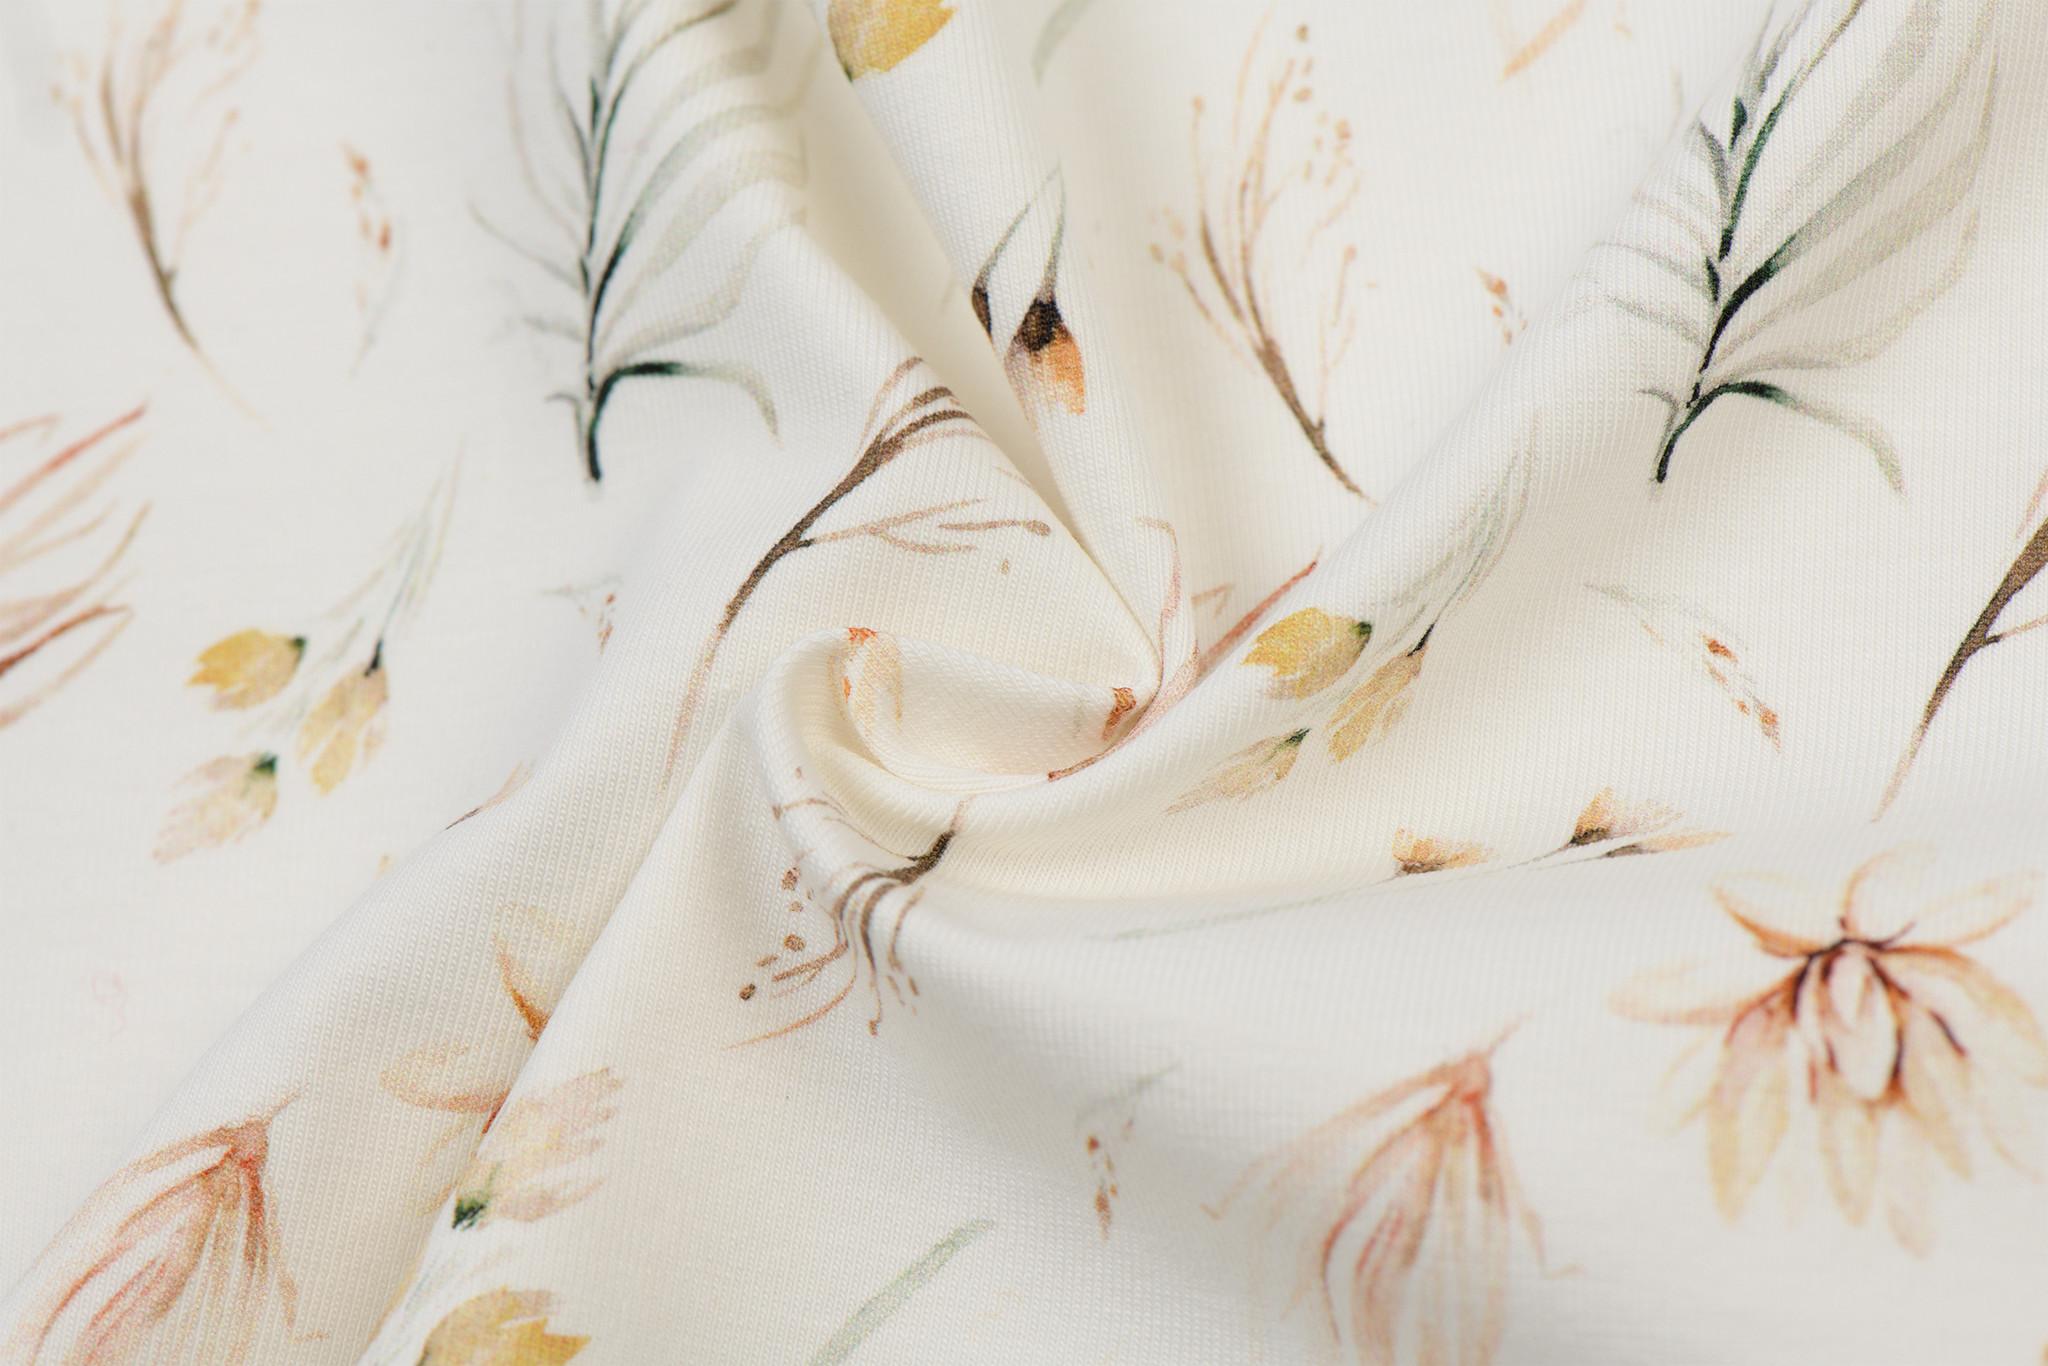 Poplin Katoen Digitale Print - Boho Boheemse Bloemen